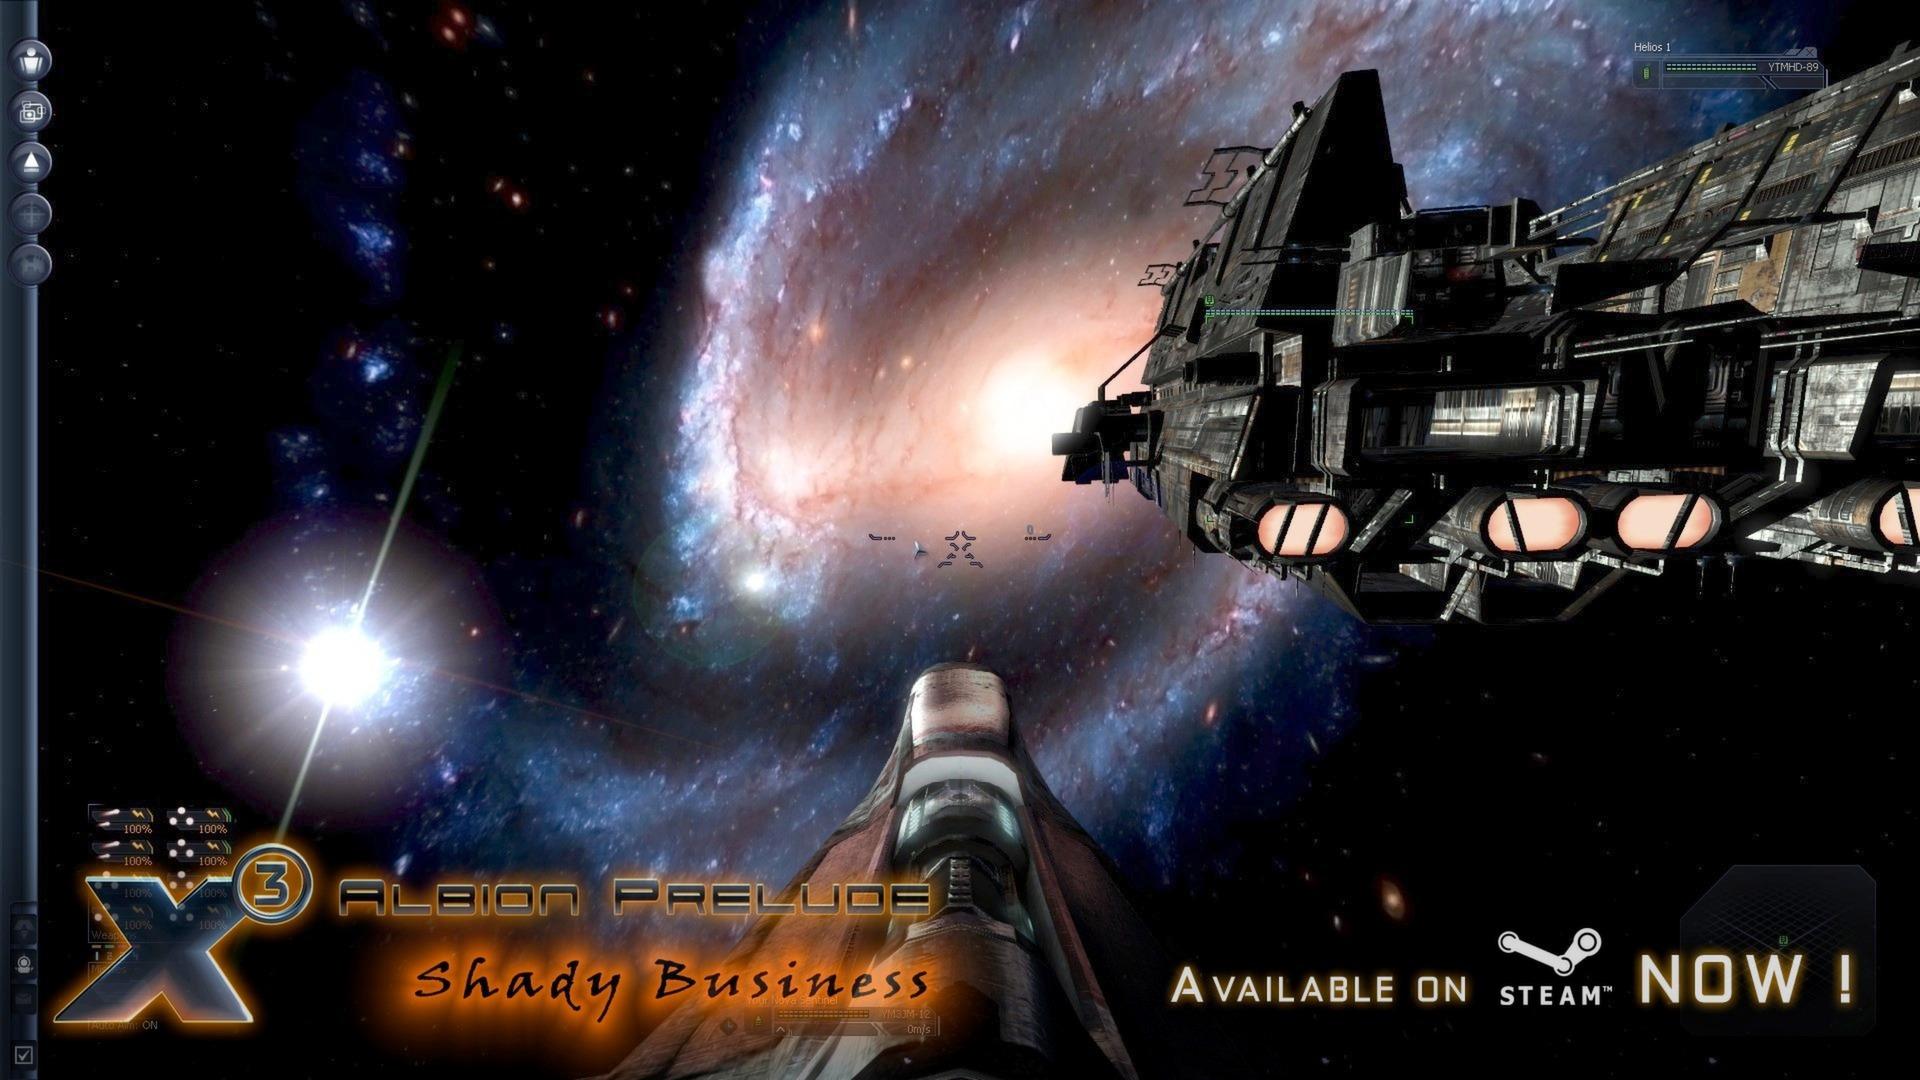 X3: Albion Prelude Screenshot 1